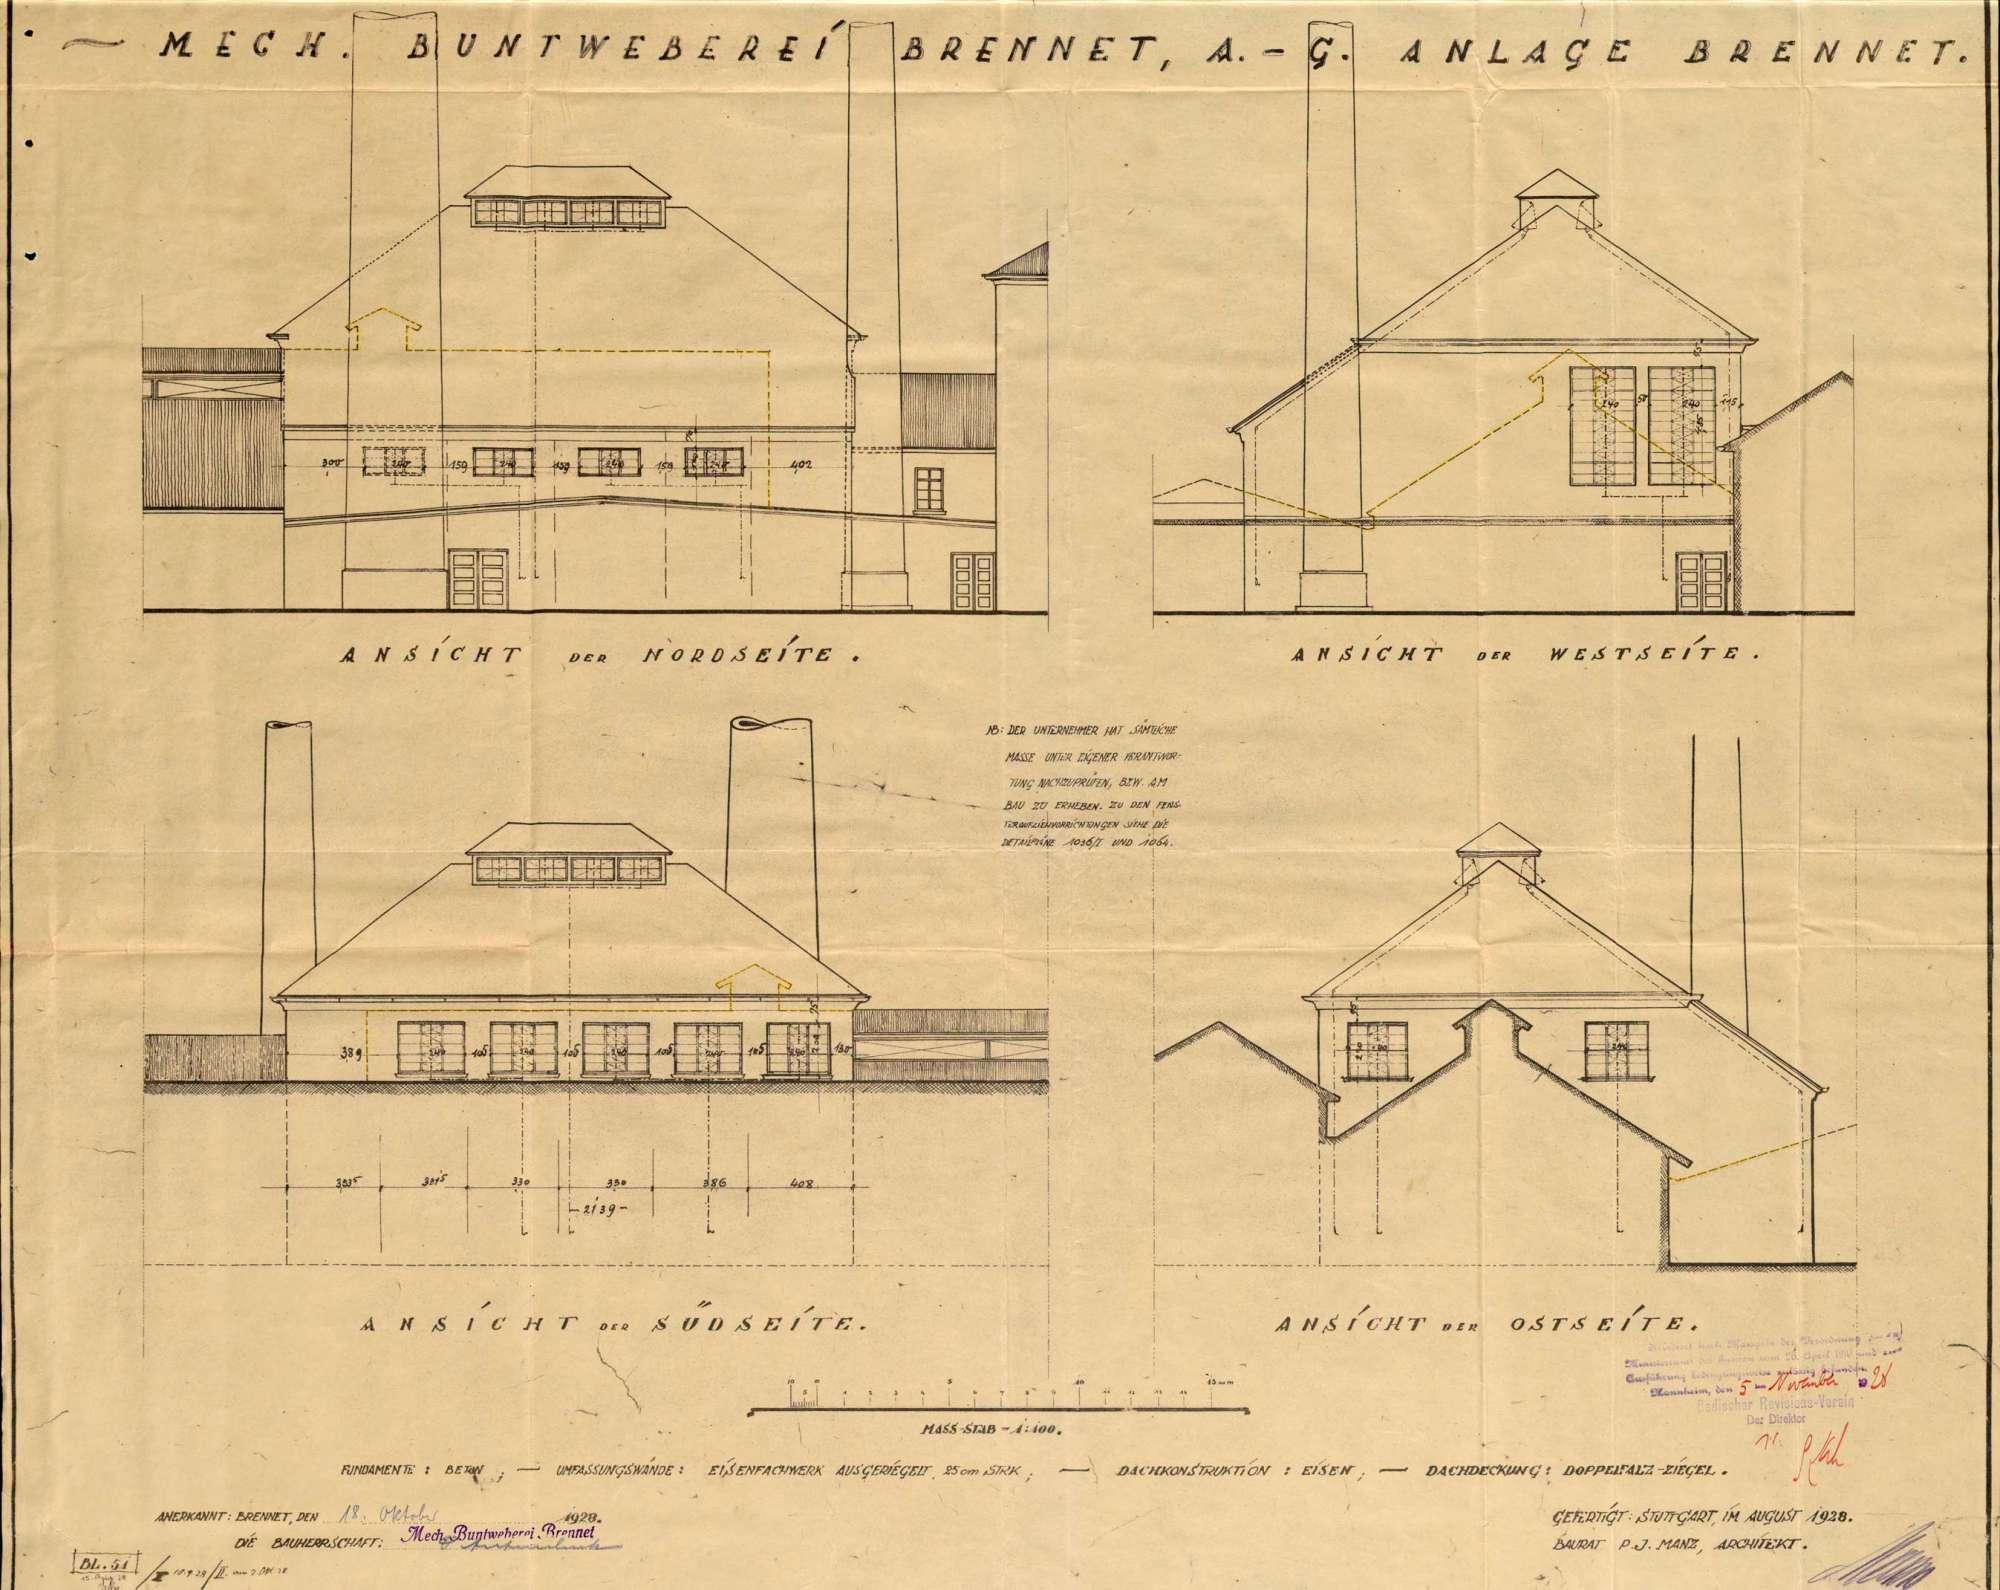 Dampfkessel der Firma C. A. Hipp & Co., Mechanische Buntweberei Brennet, in Öflingen, Bild 3